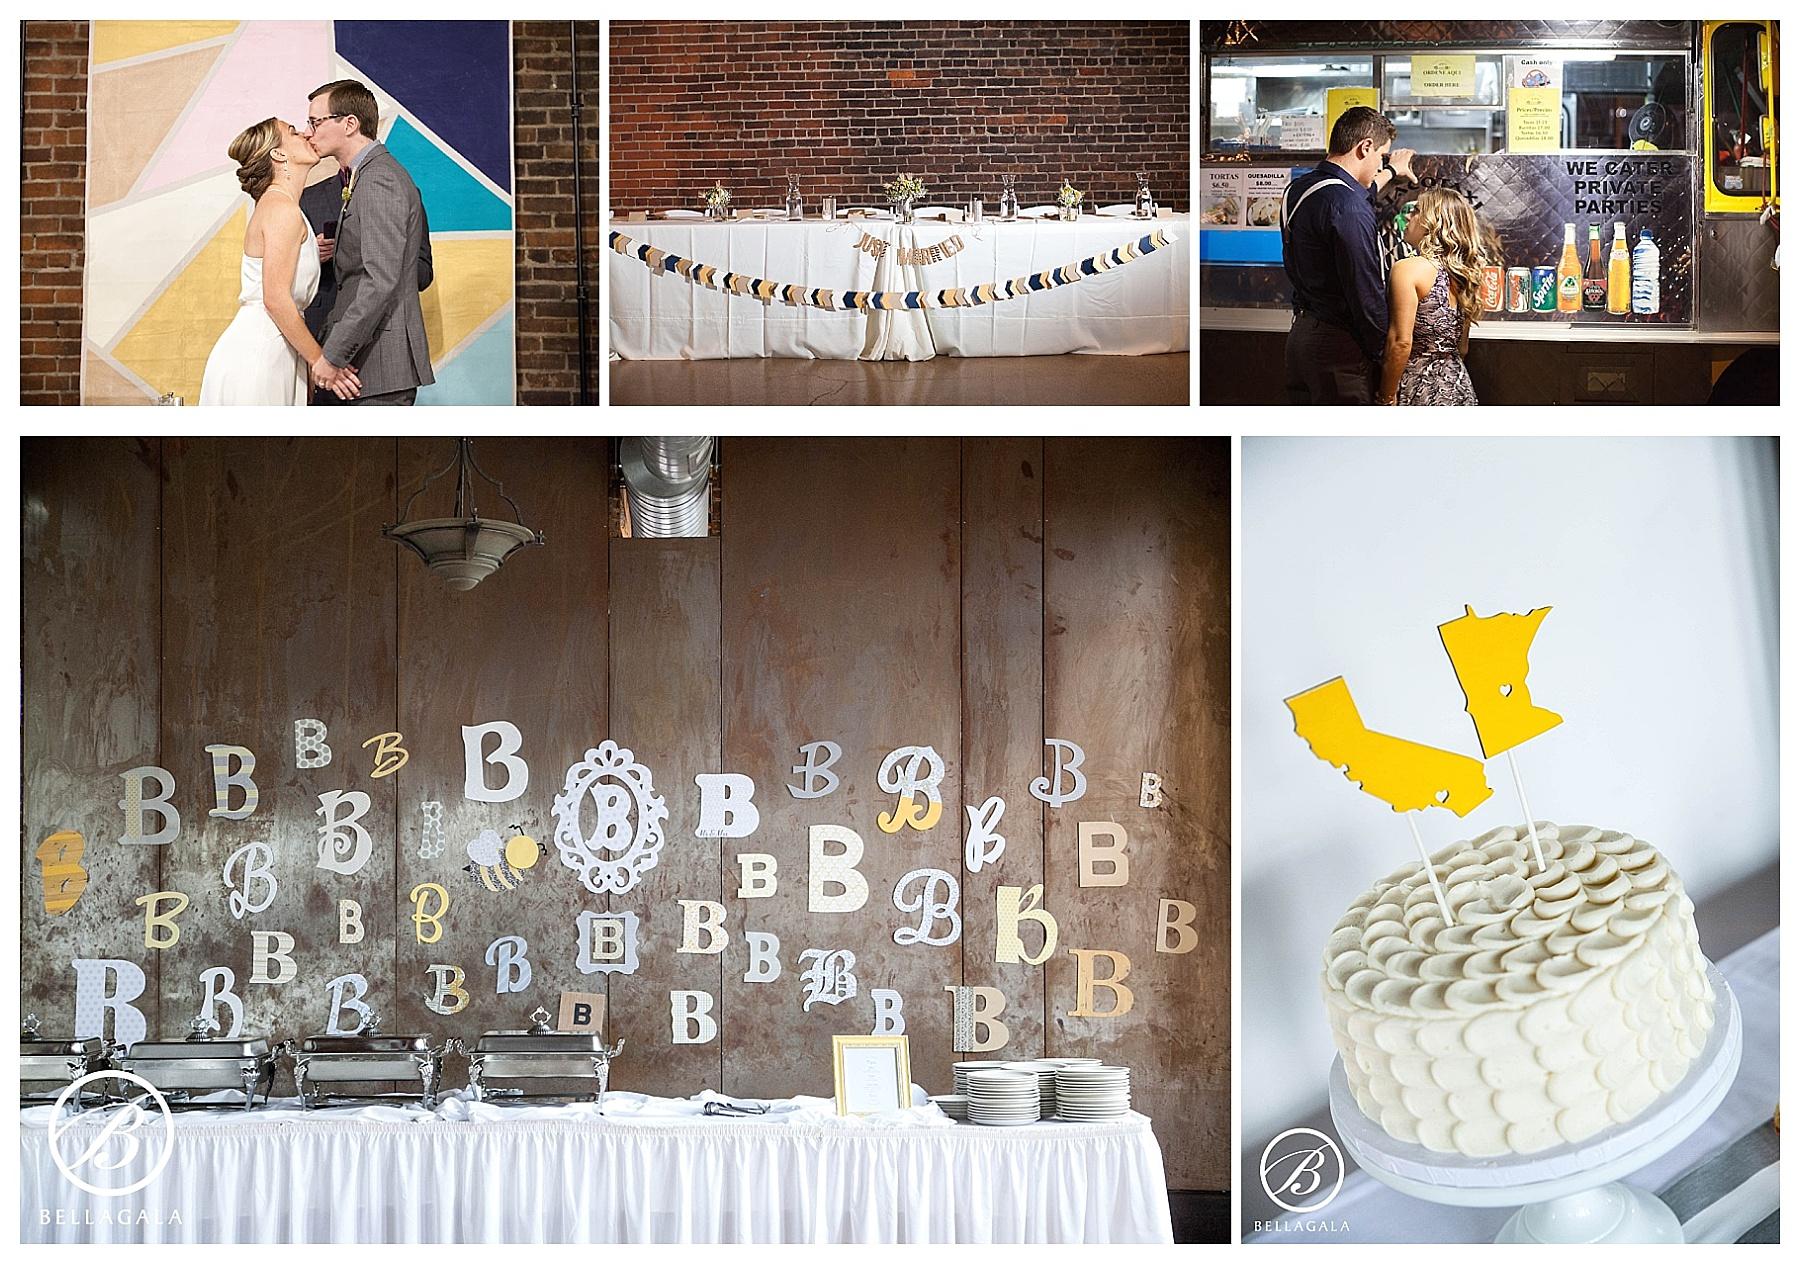 Emily Barrera Photography (top row), Bellagala Photography (bottom row)